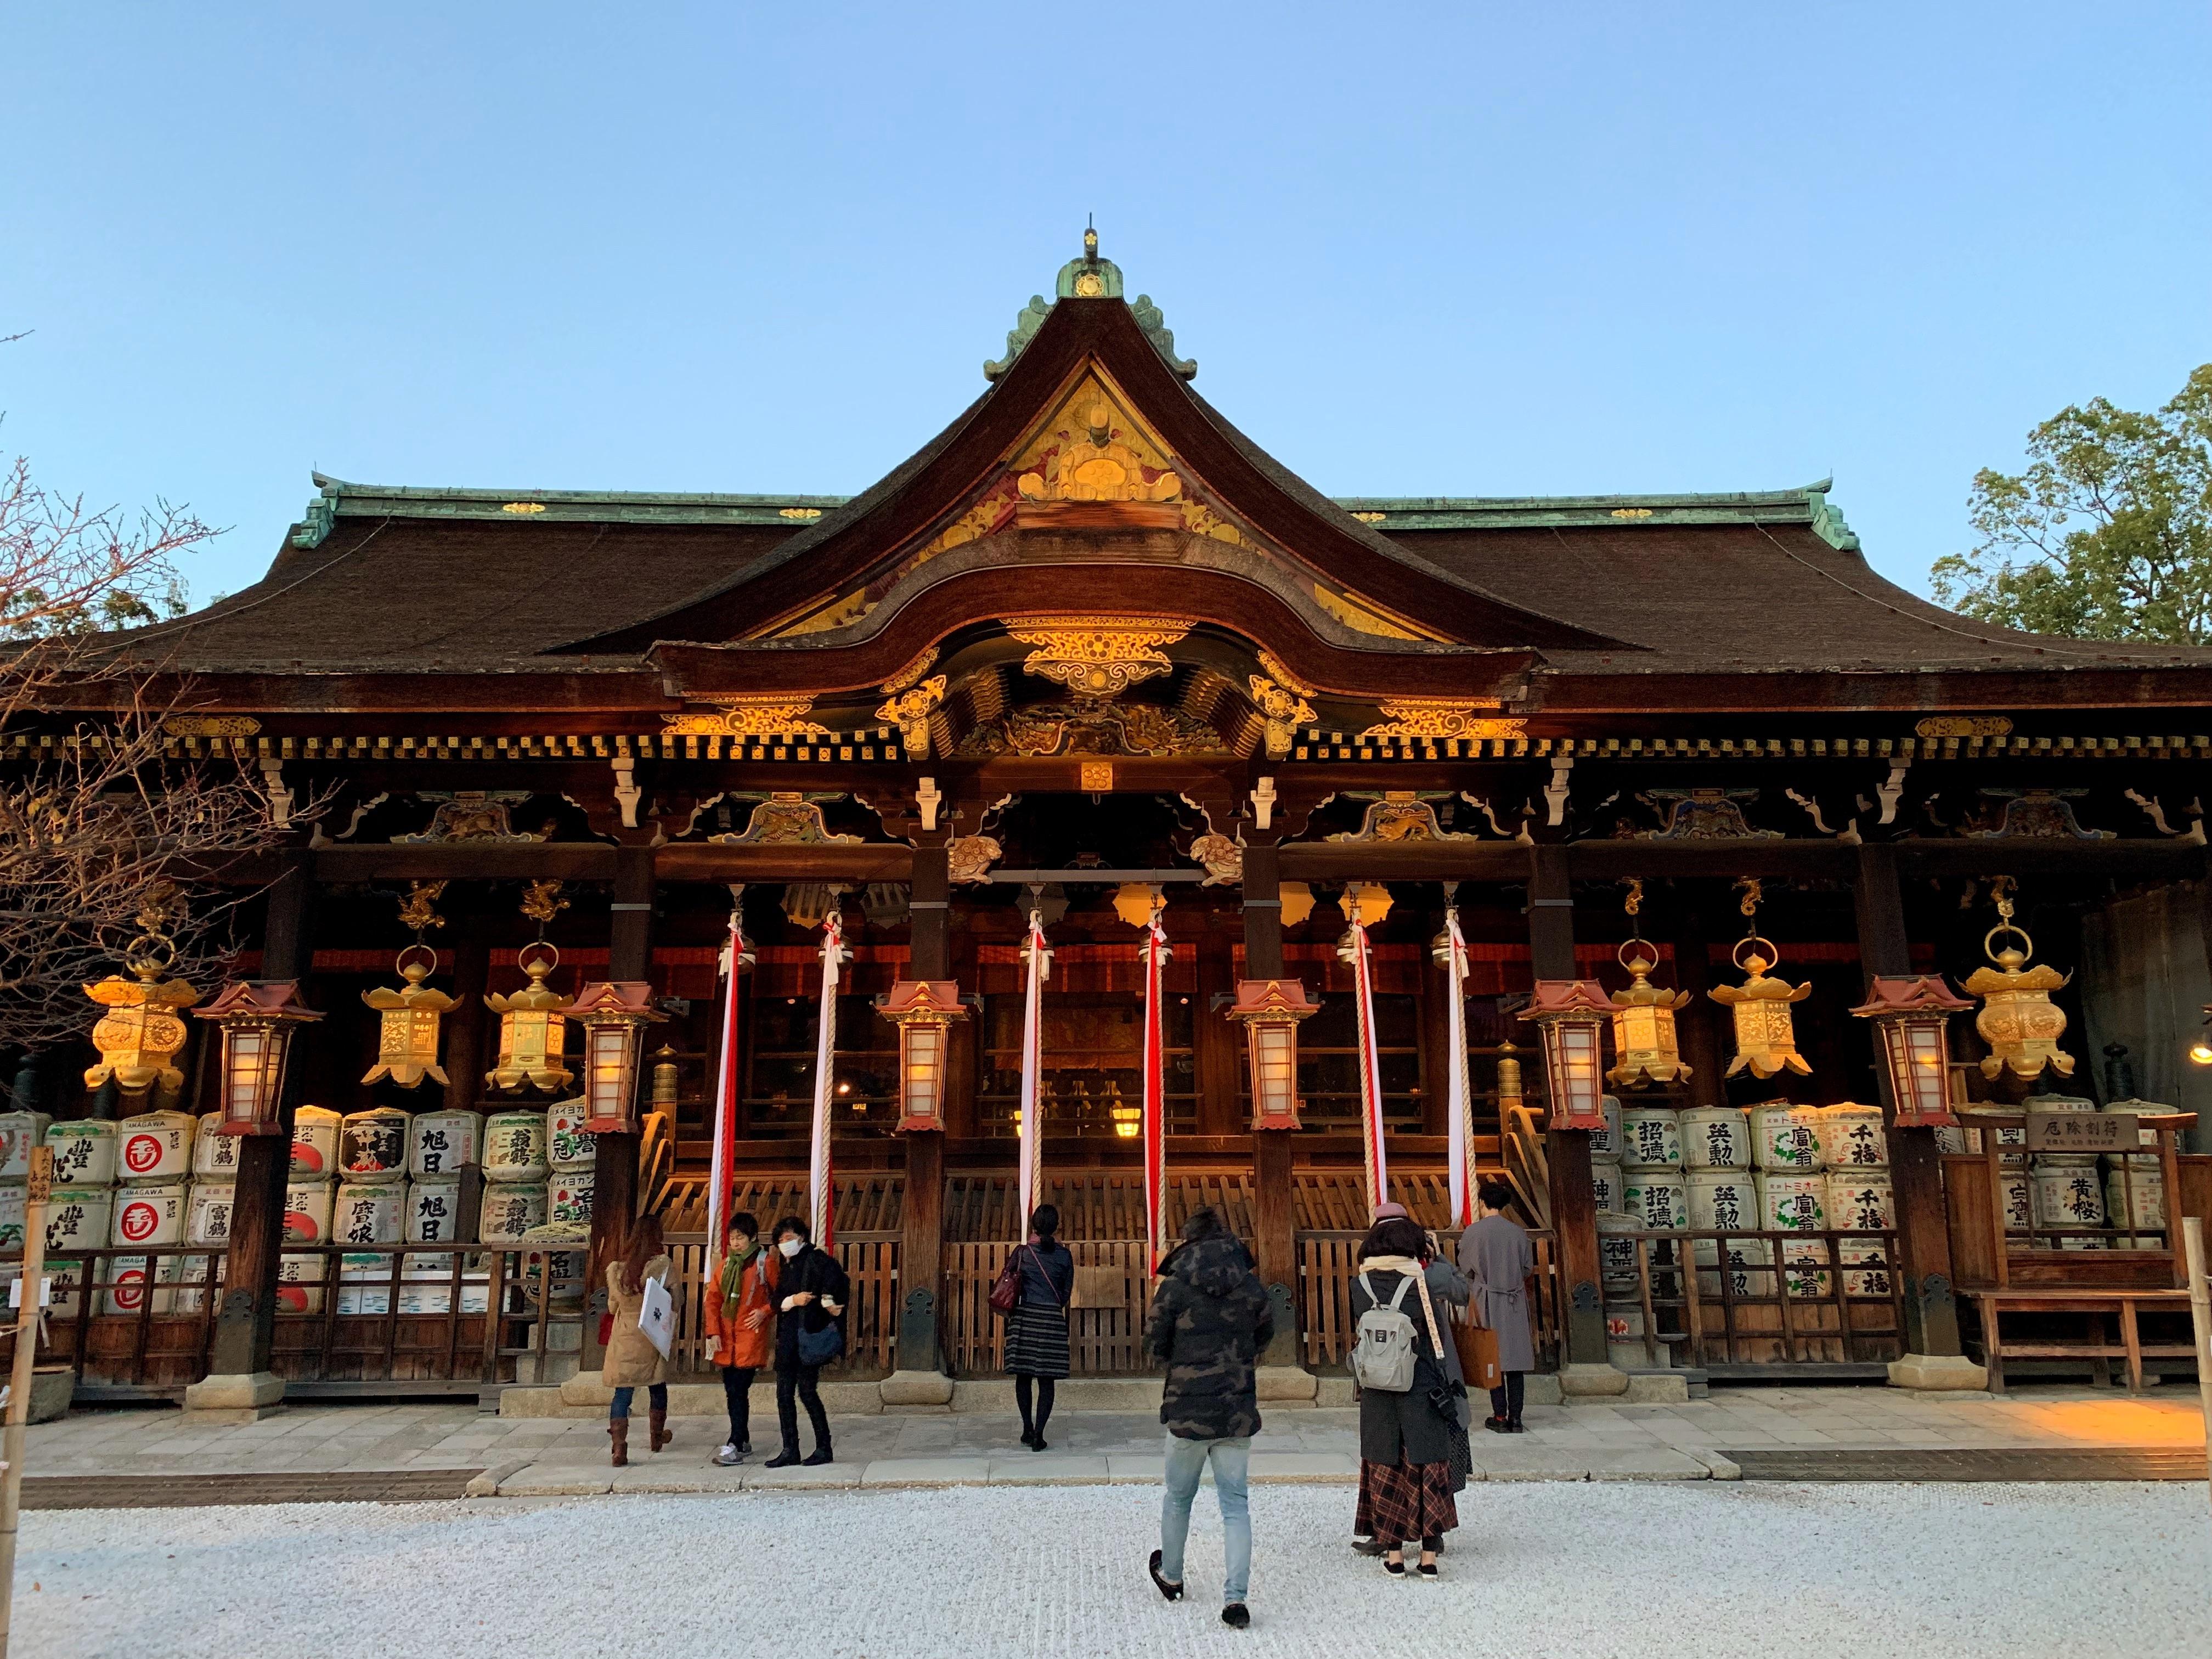 北野天満宮の拝殿